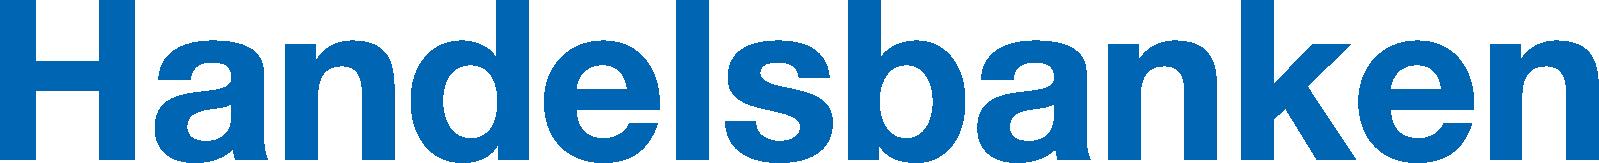 Handelsbanken Logo png